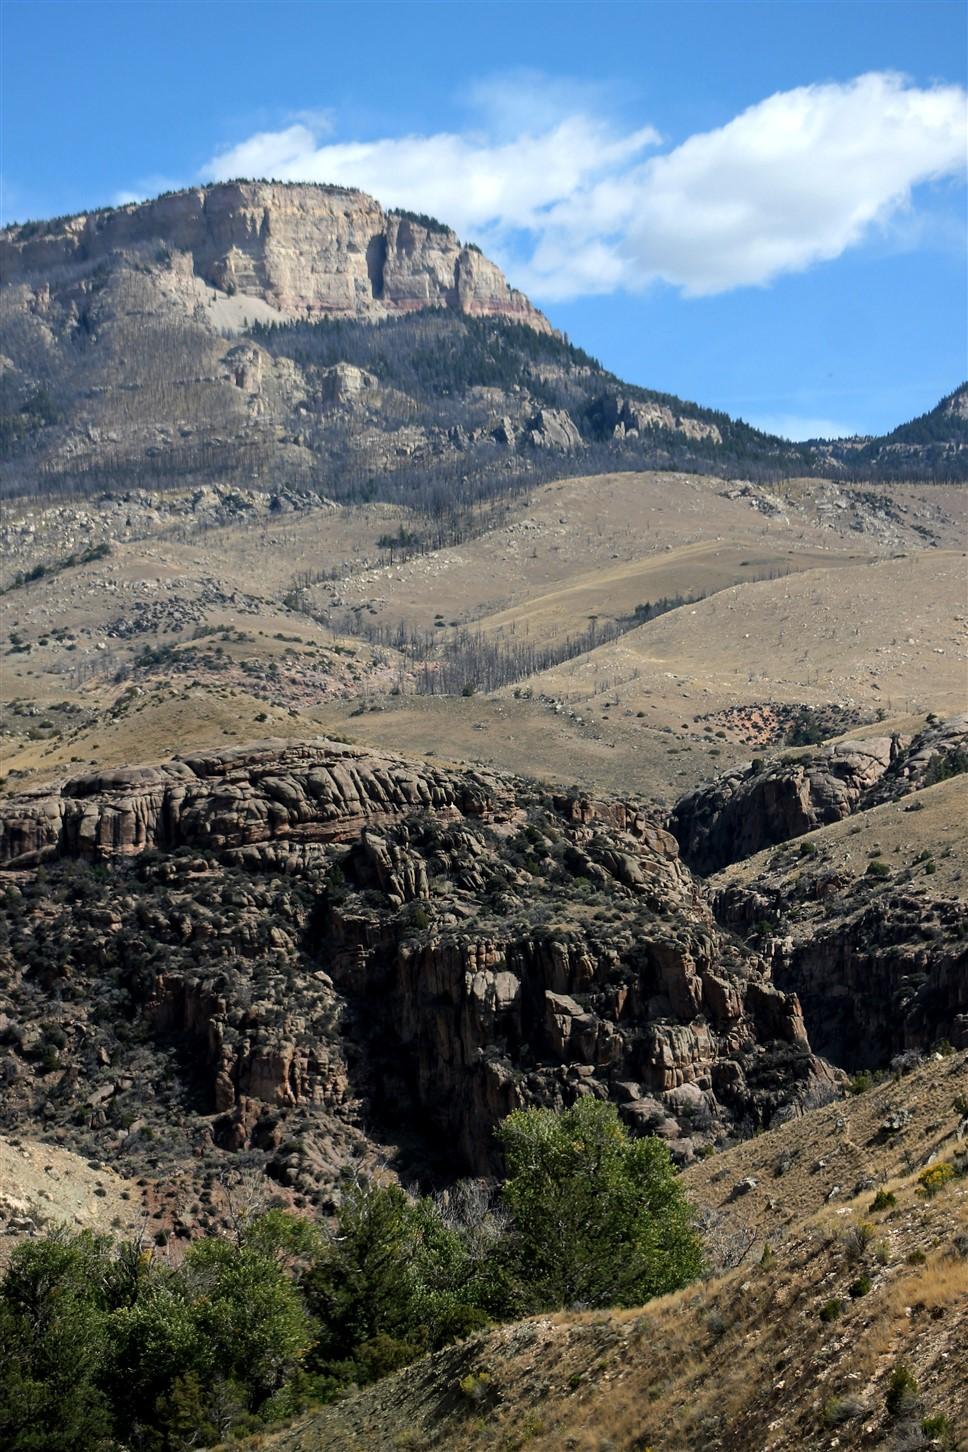 2015 09 10 121 Northern Wyoming Mountains